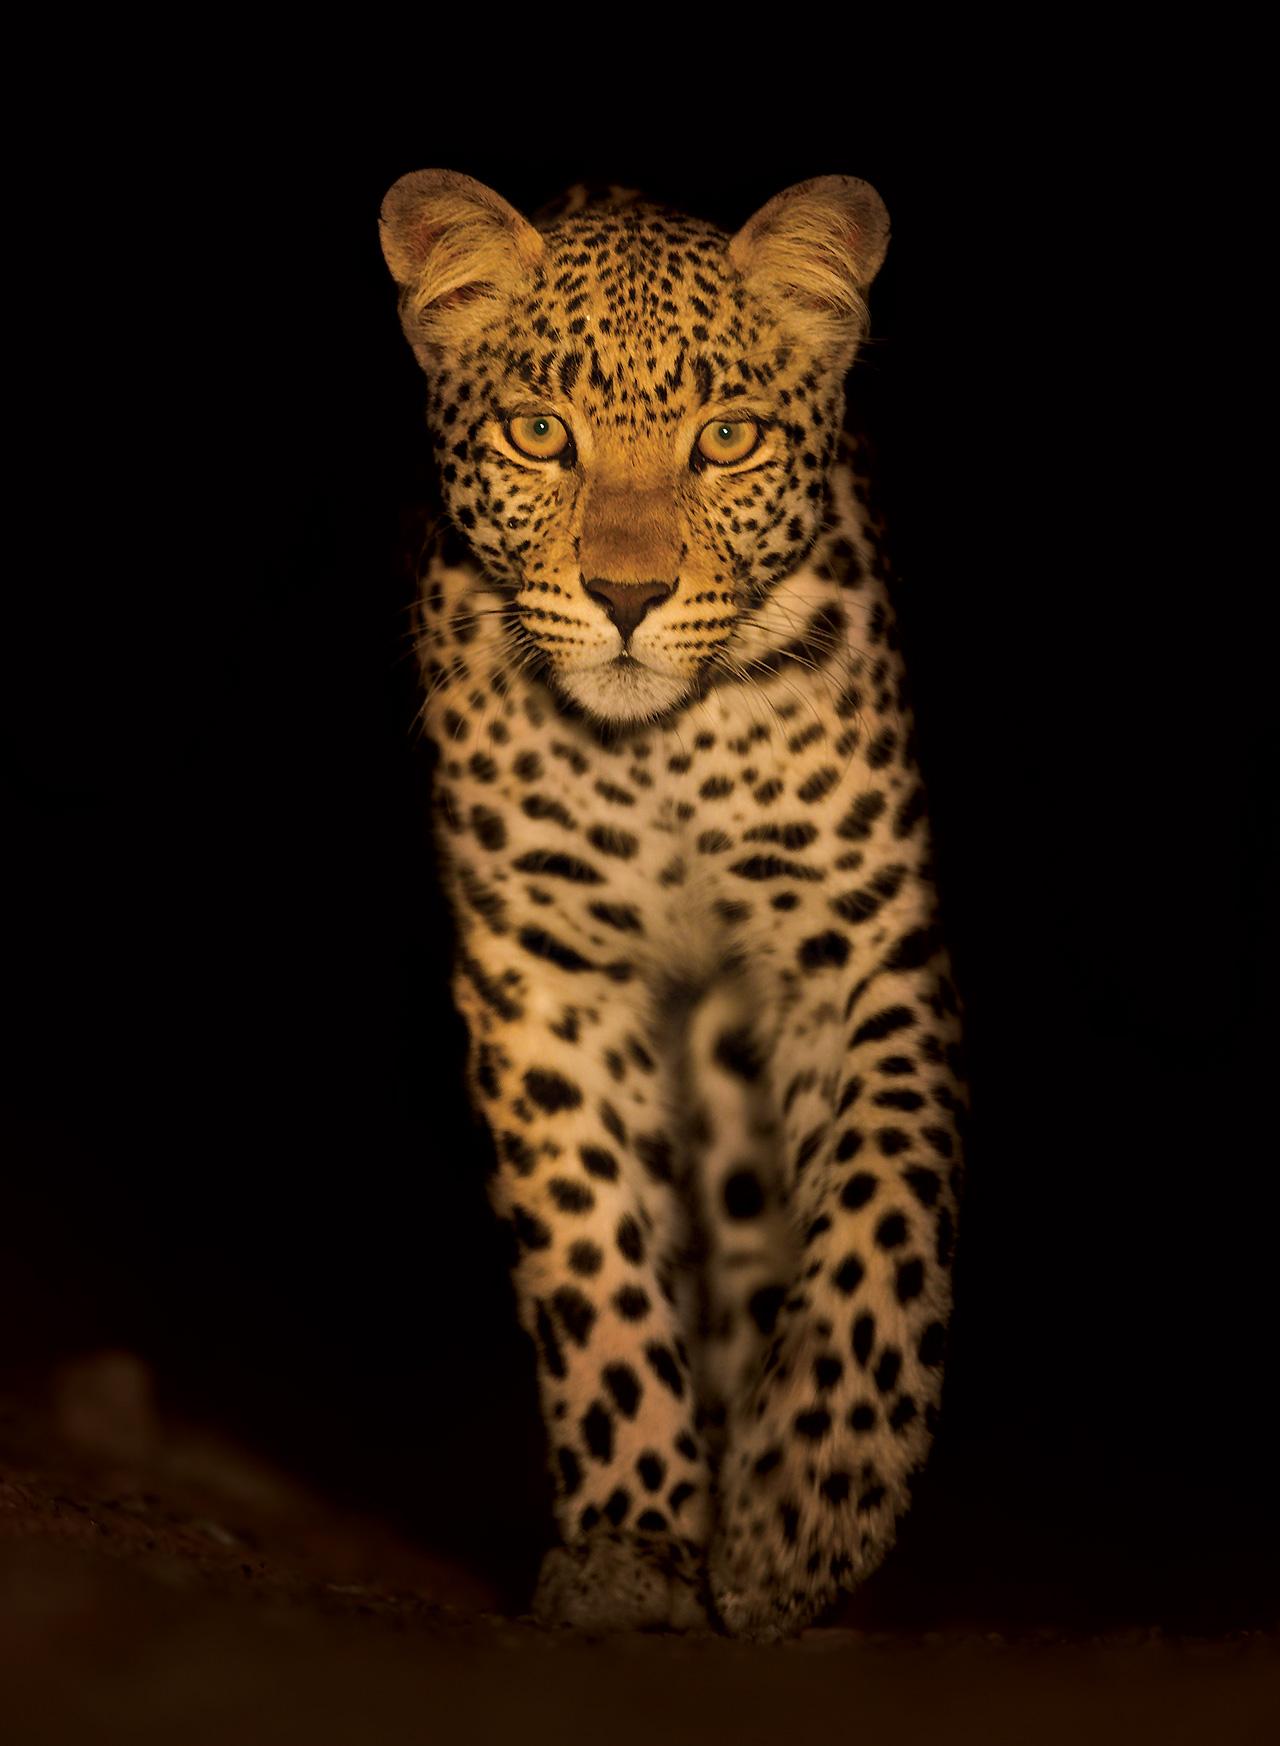 Hannes-Lochner-Kalahari-leopard-walking